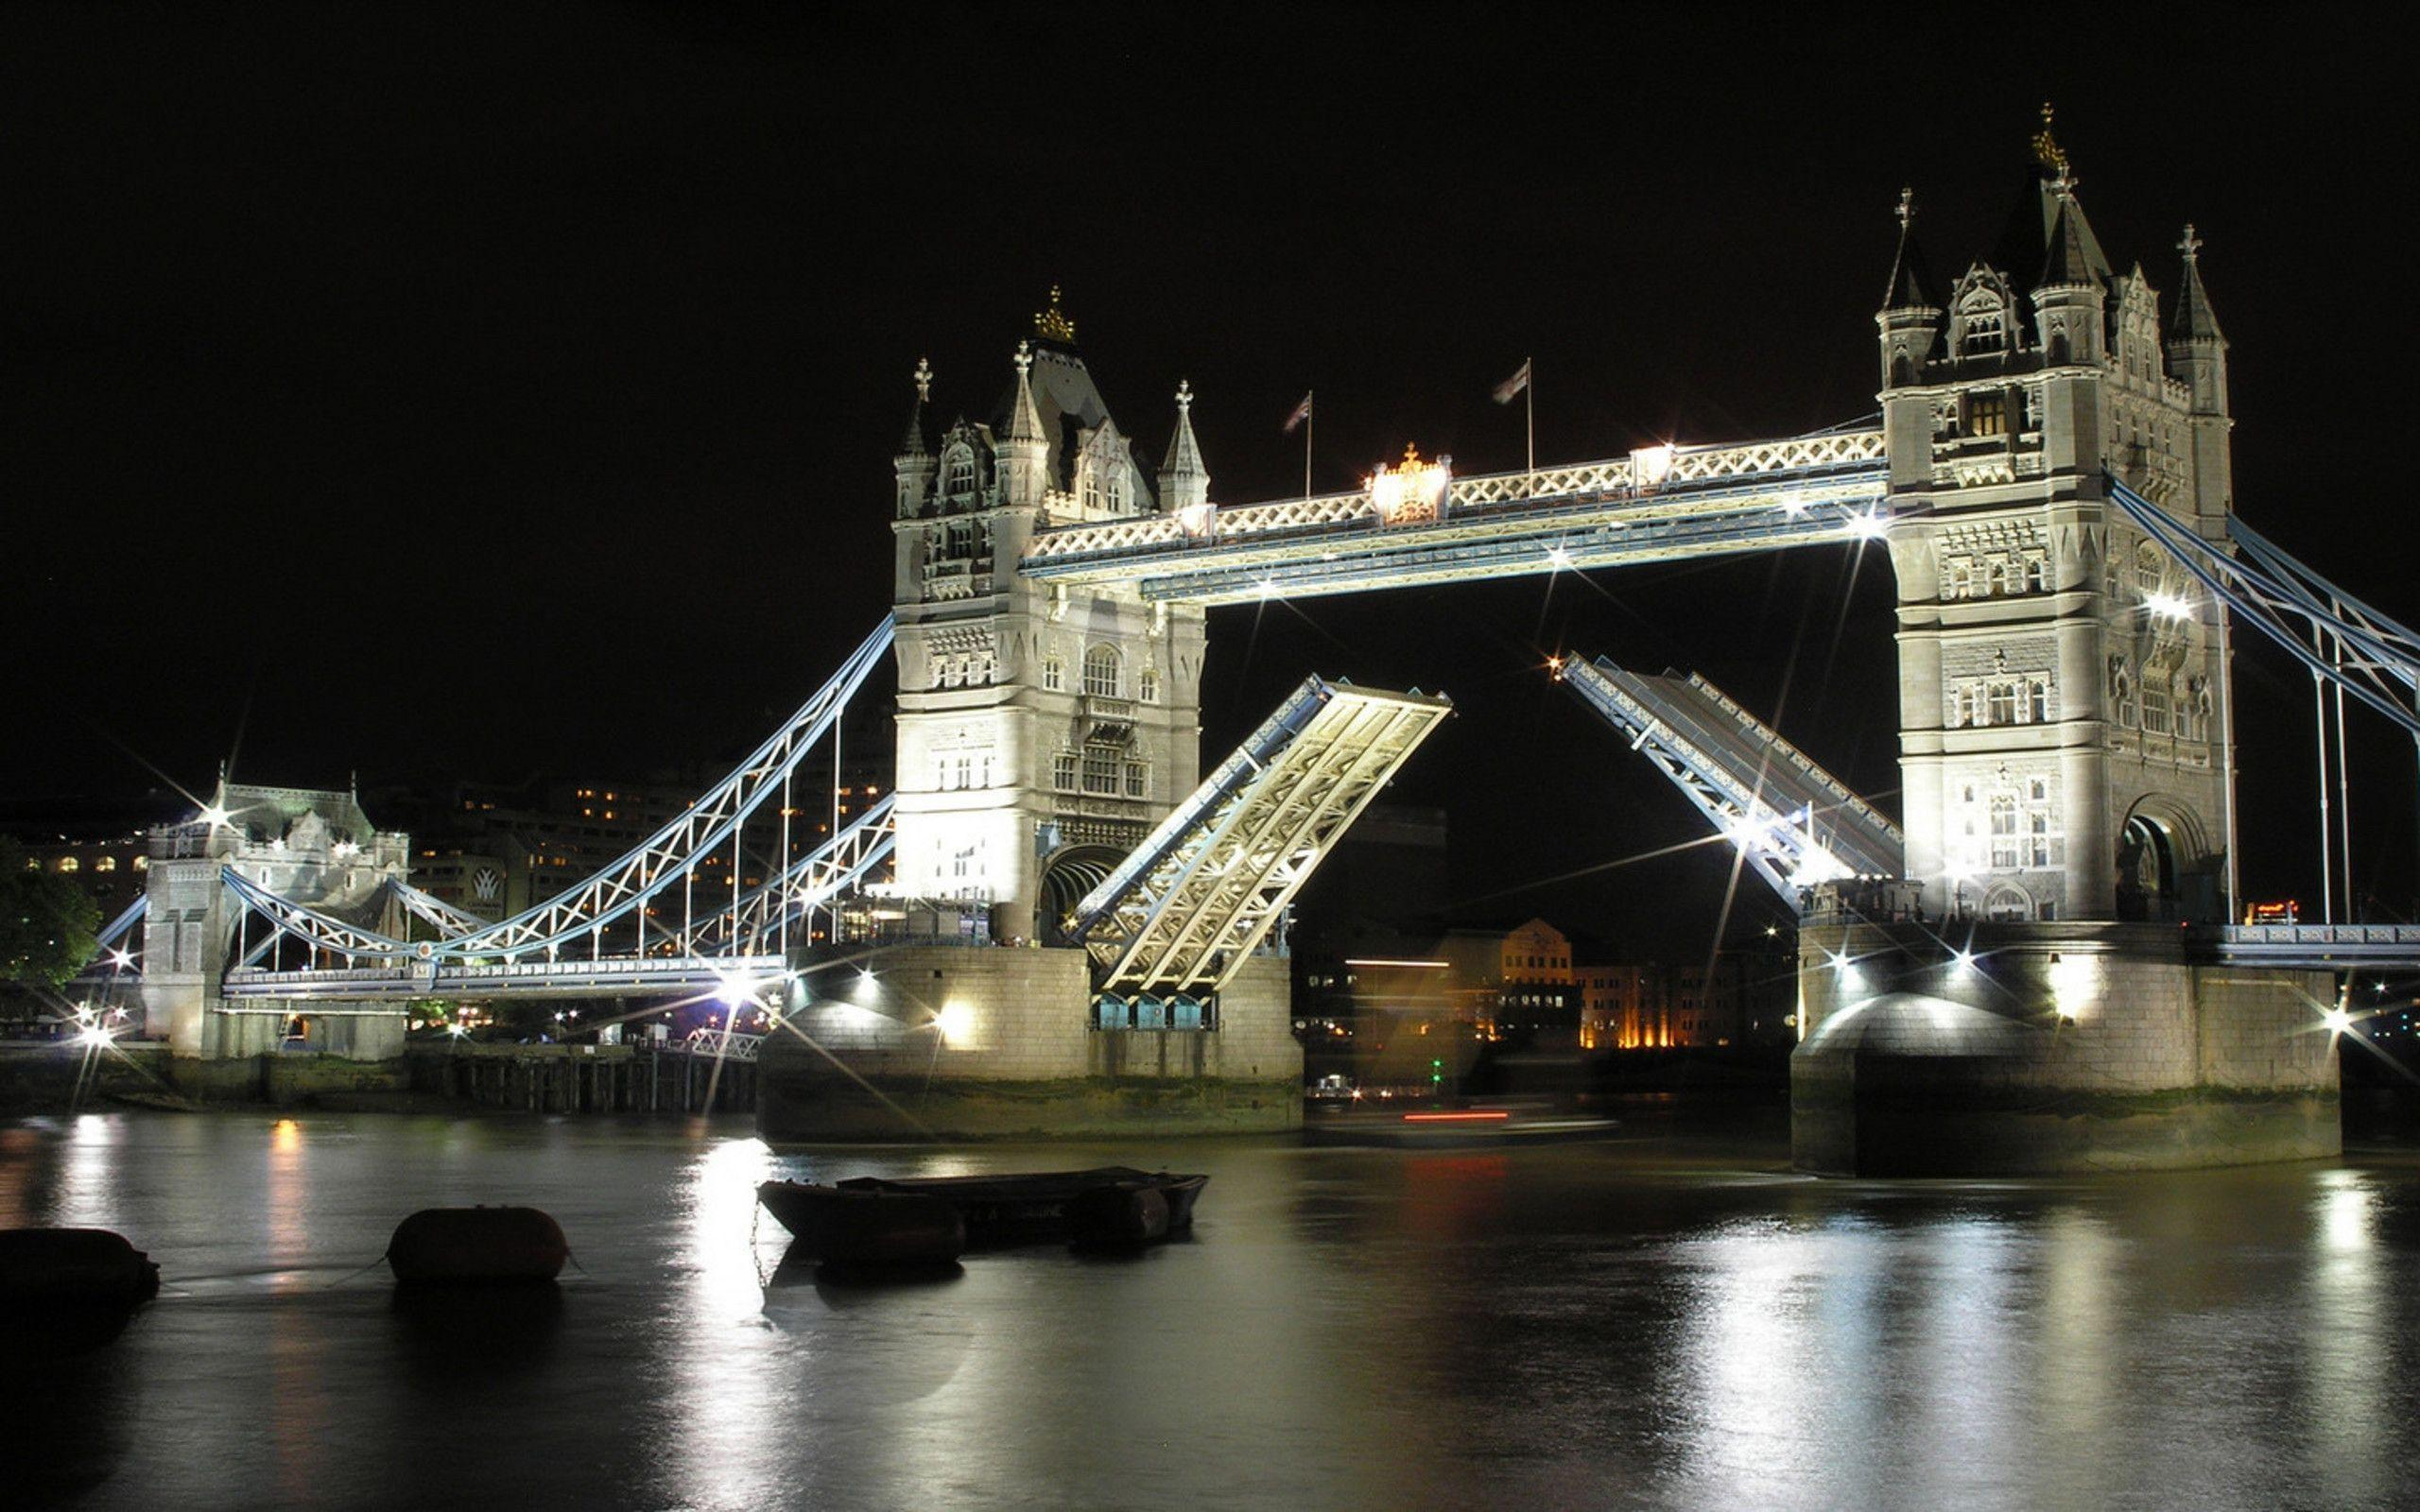 wallpaper bridge london scenic - photo #27